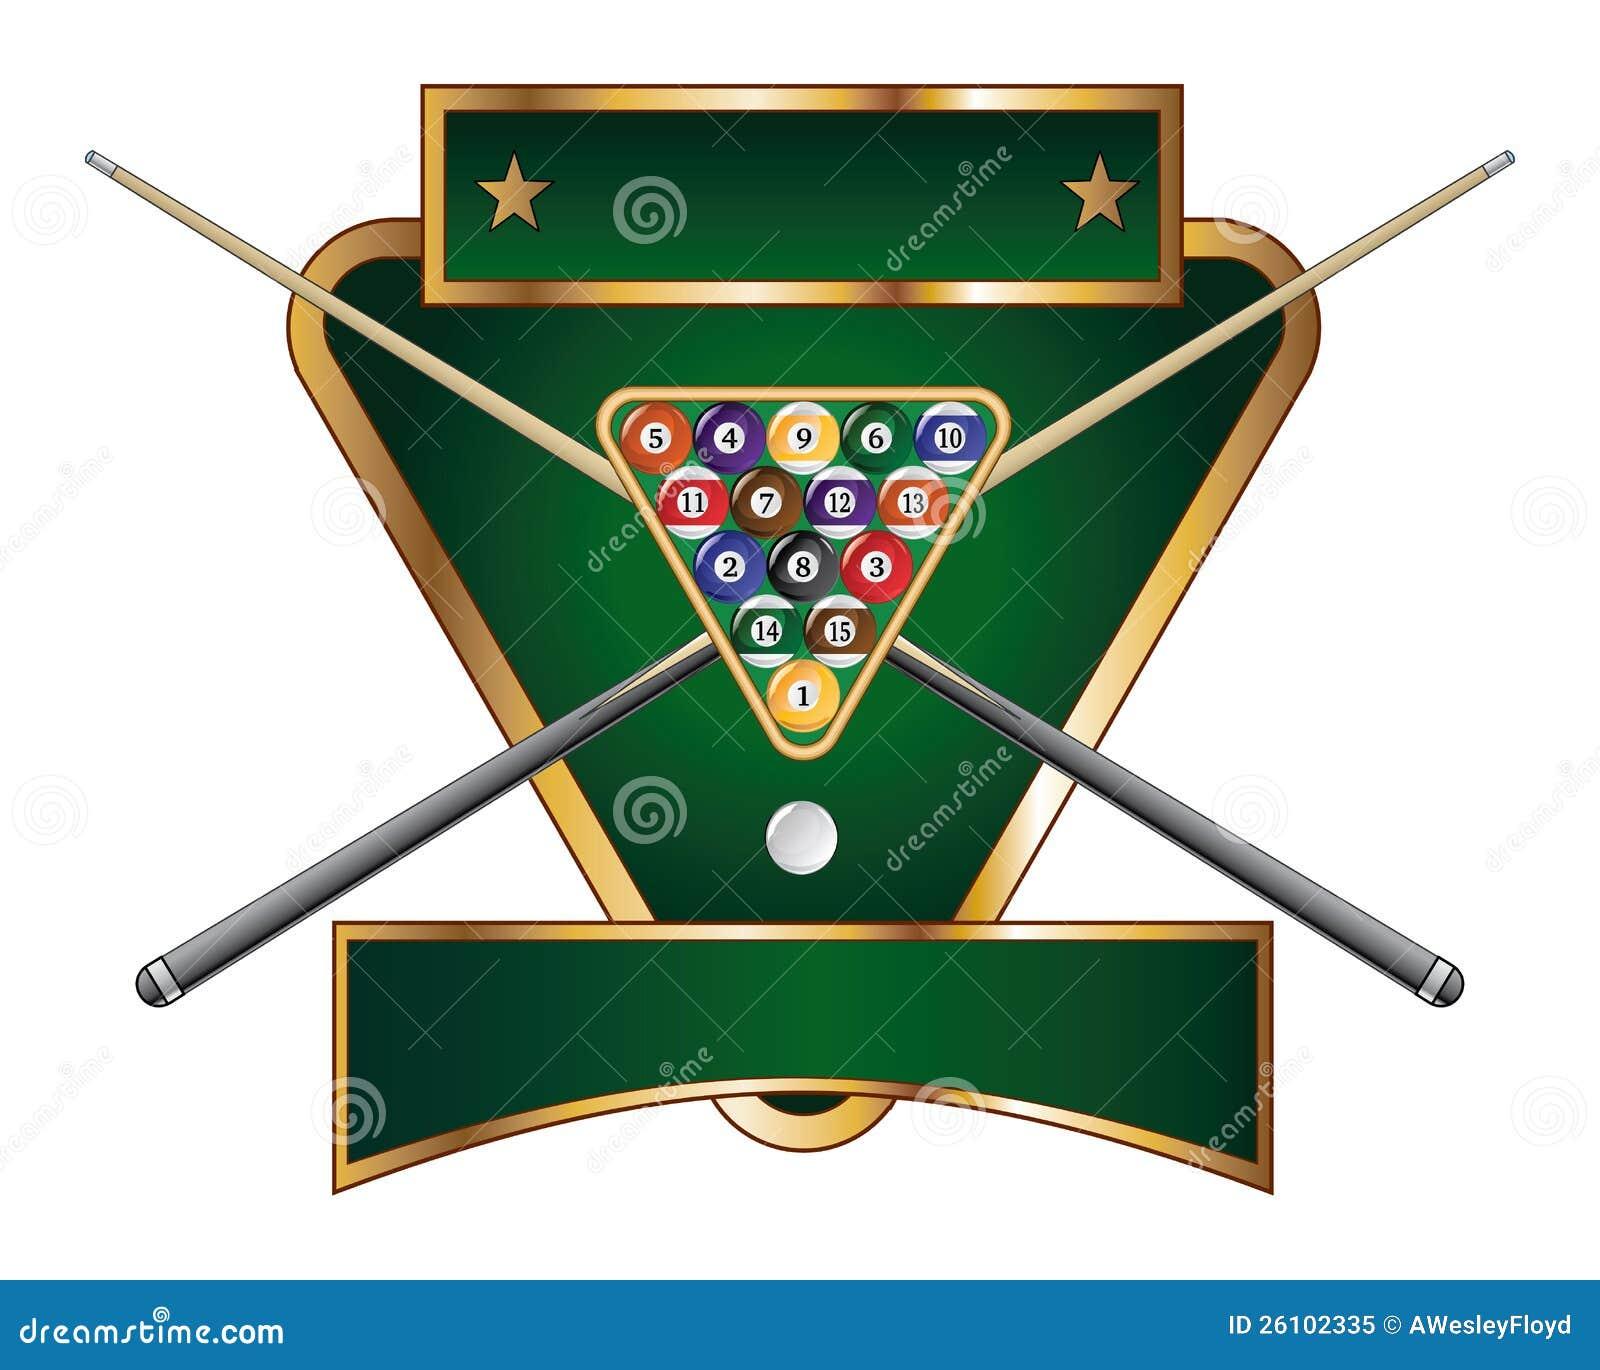 Billiards Stock Illustrations – 2,221 Billiards Stock ...